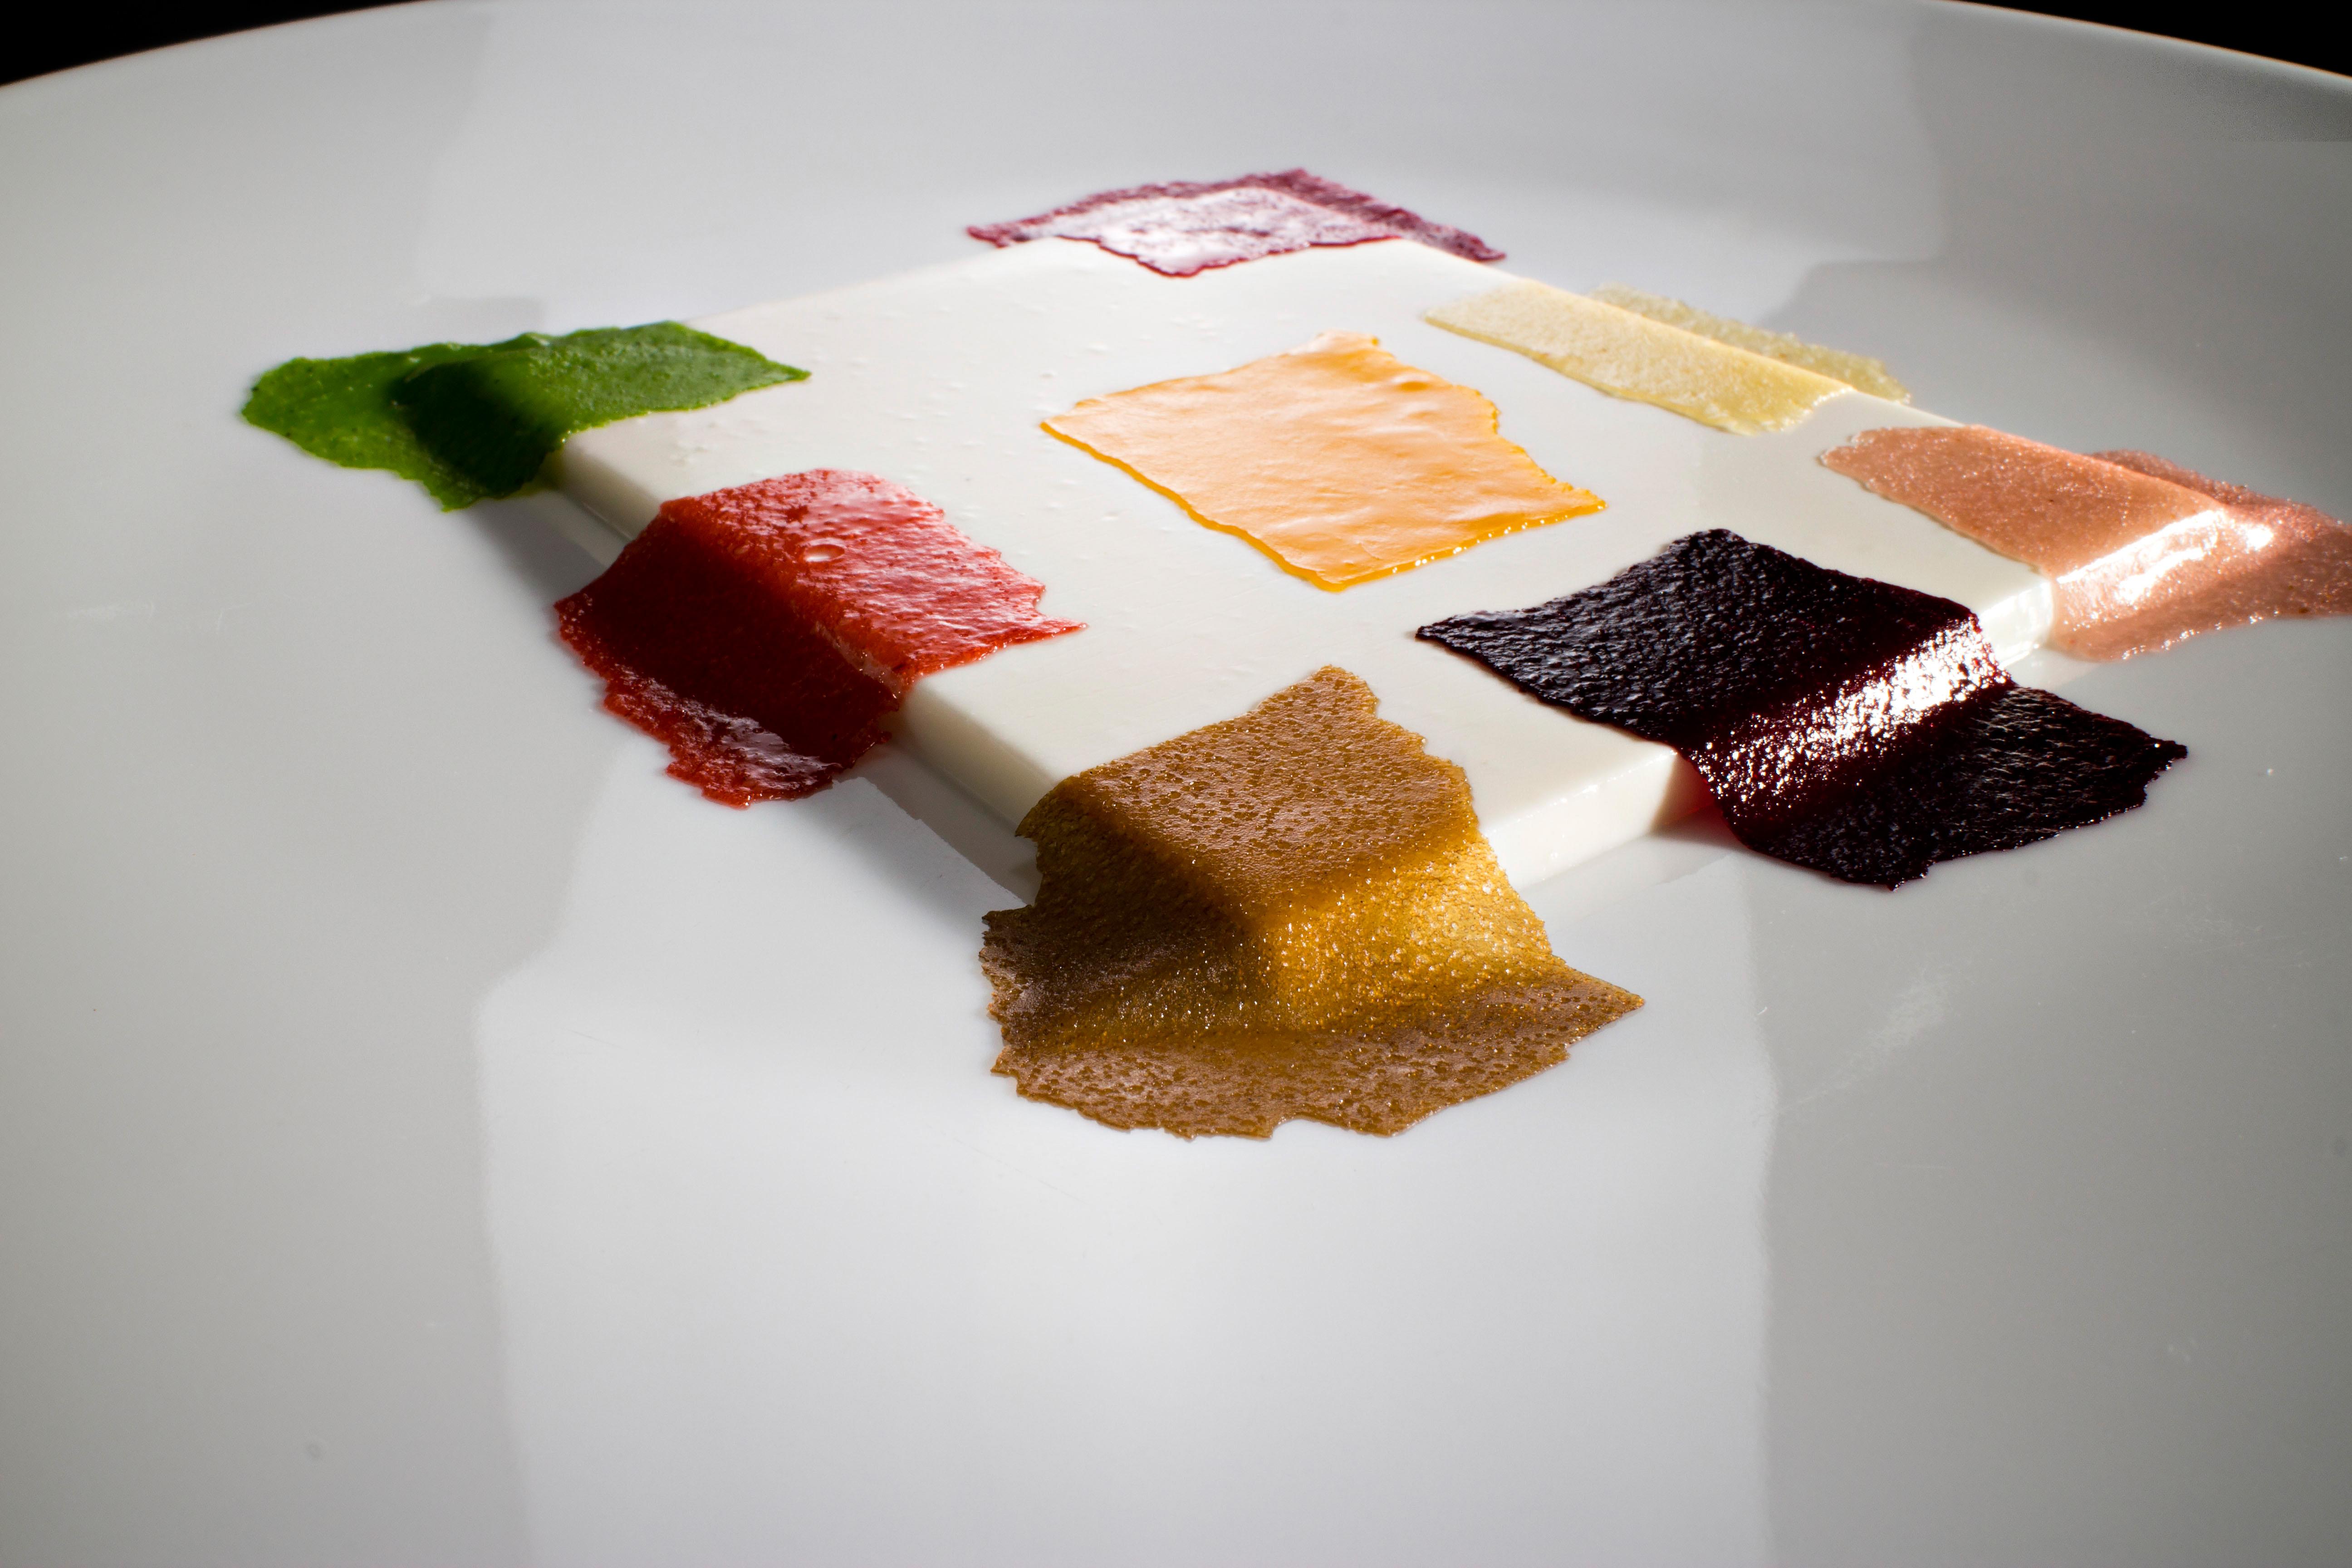 piazza-duomo-gallery-cucina-00001-hd